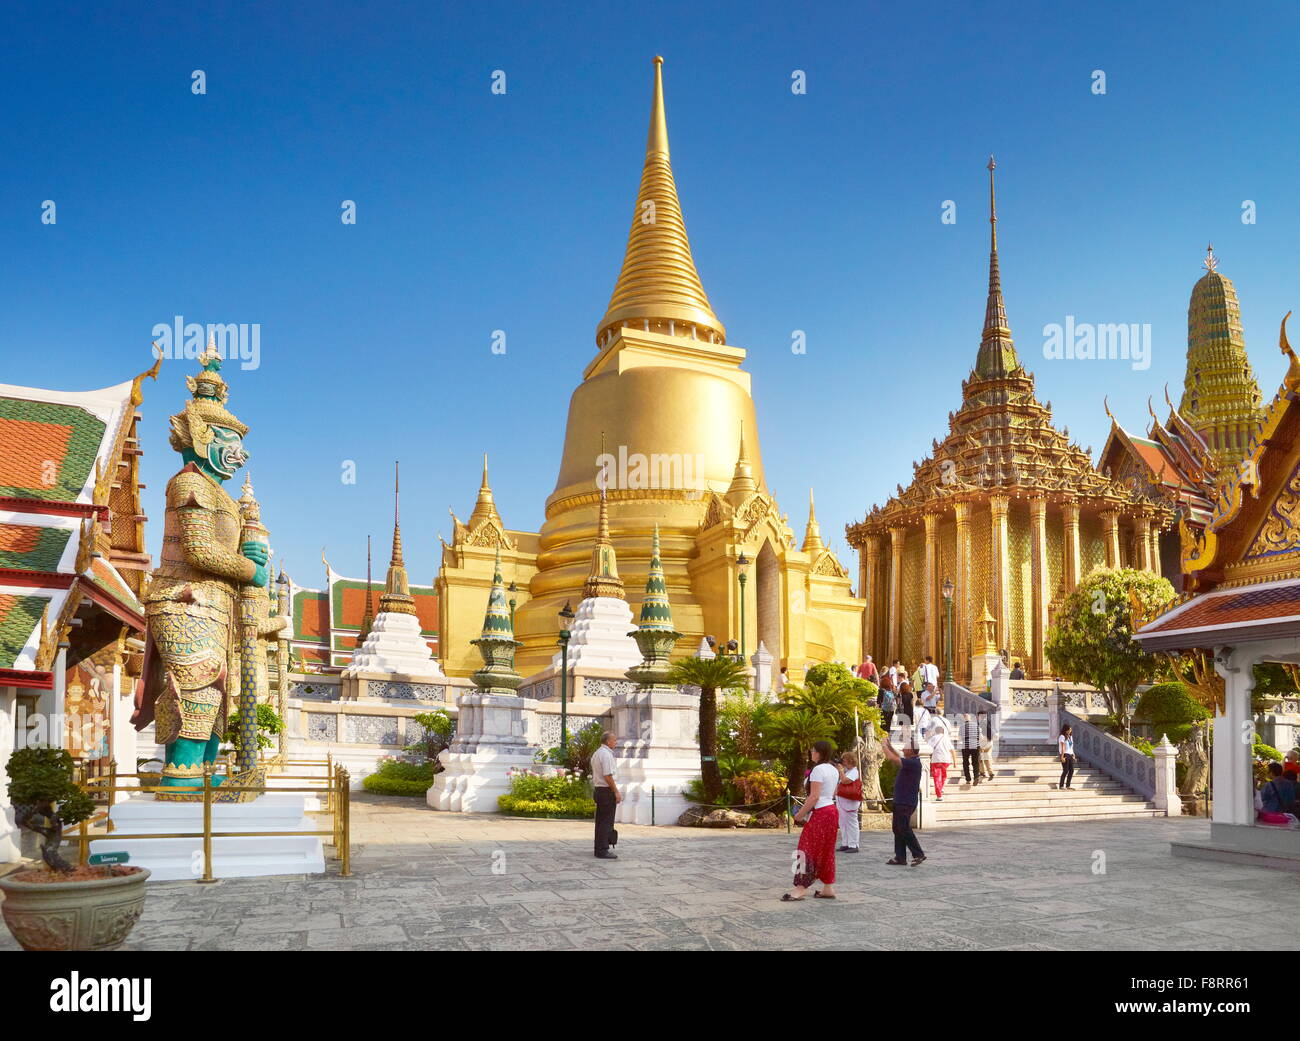 Thailandia - Bangkok, Grand Royal Palace, Wat Phra Kaeo, Golden Chedi Immagini Stock